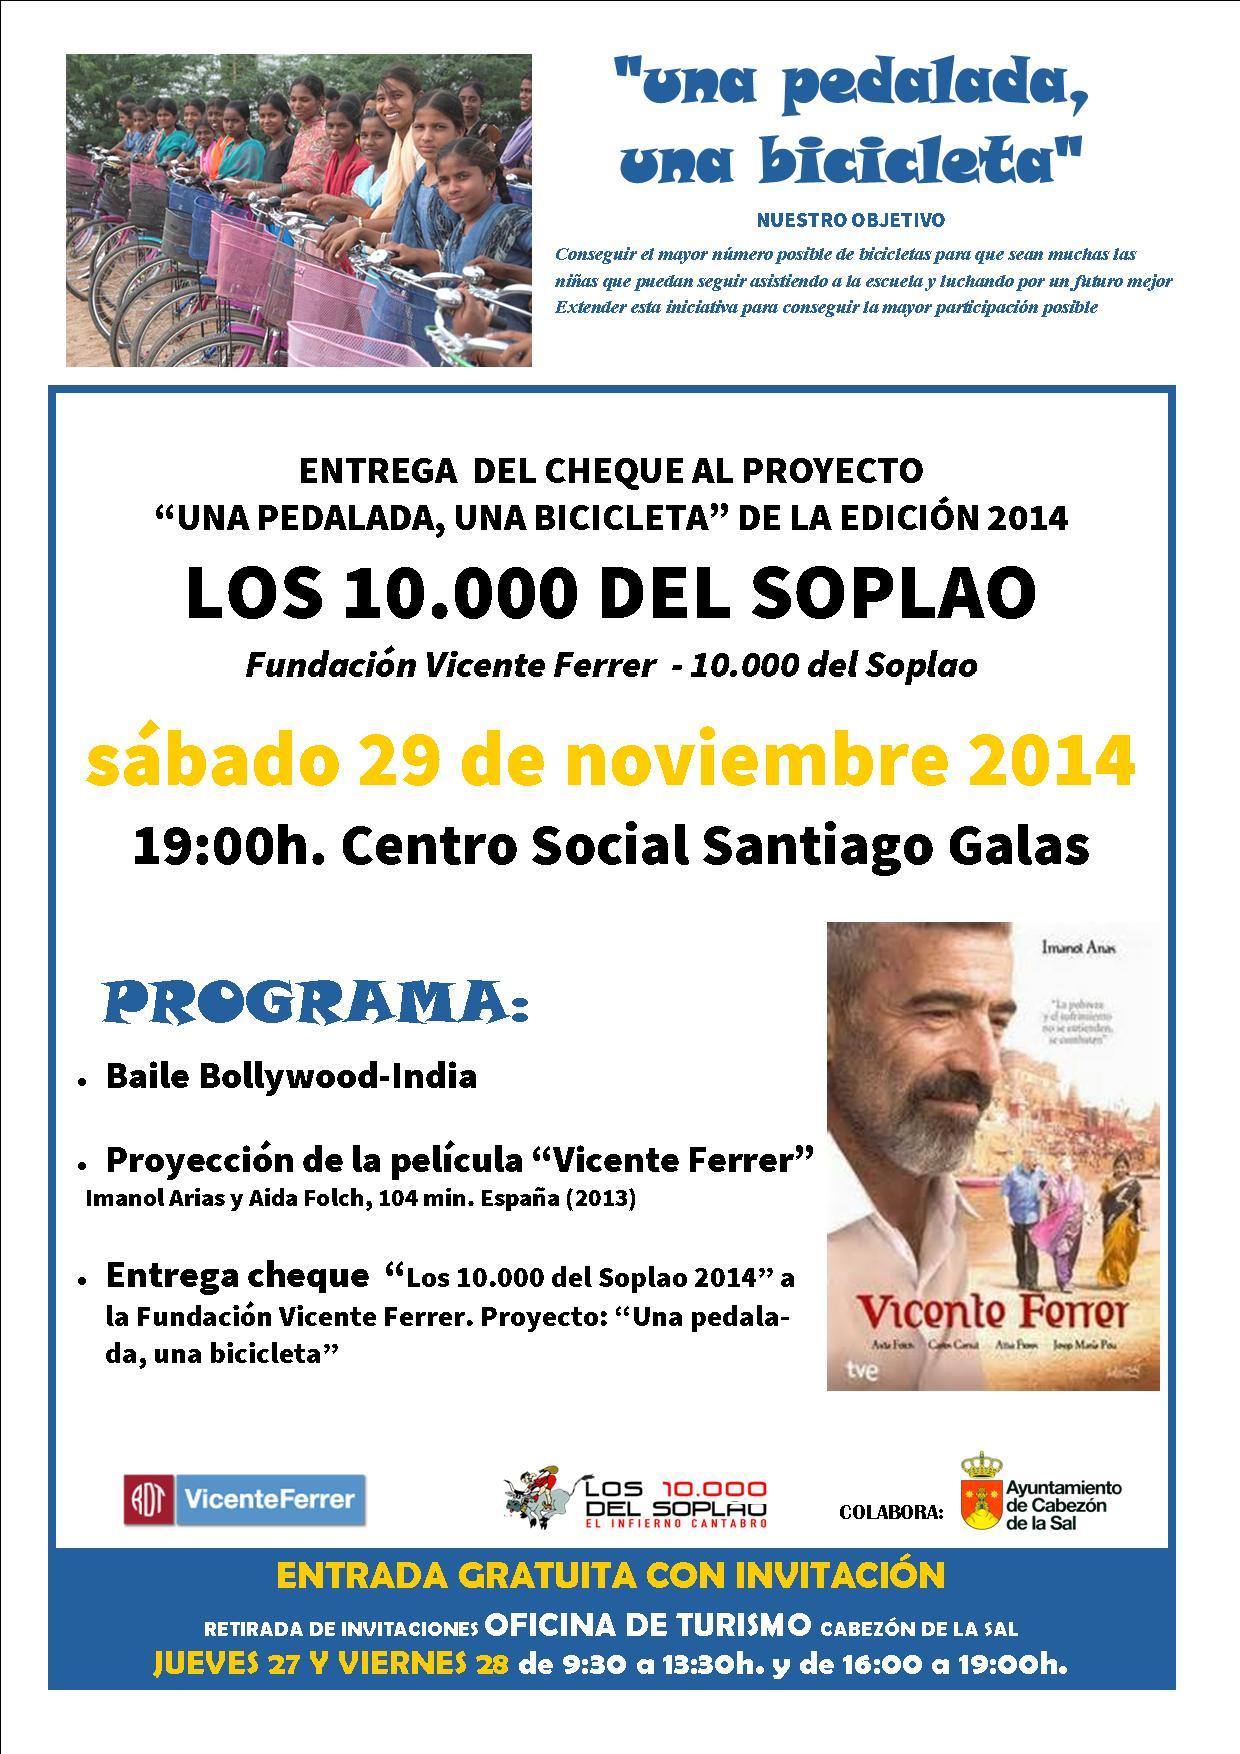 http://www.cabezondelasal.net/wp-content/uploads/2014/11/Vicente-Ferrer-CARTEL-10000-SOPLAO.jpg